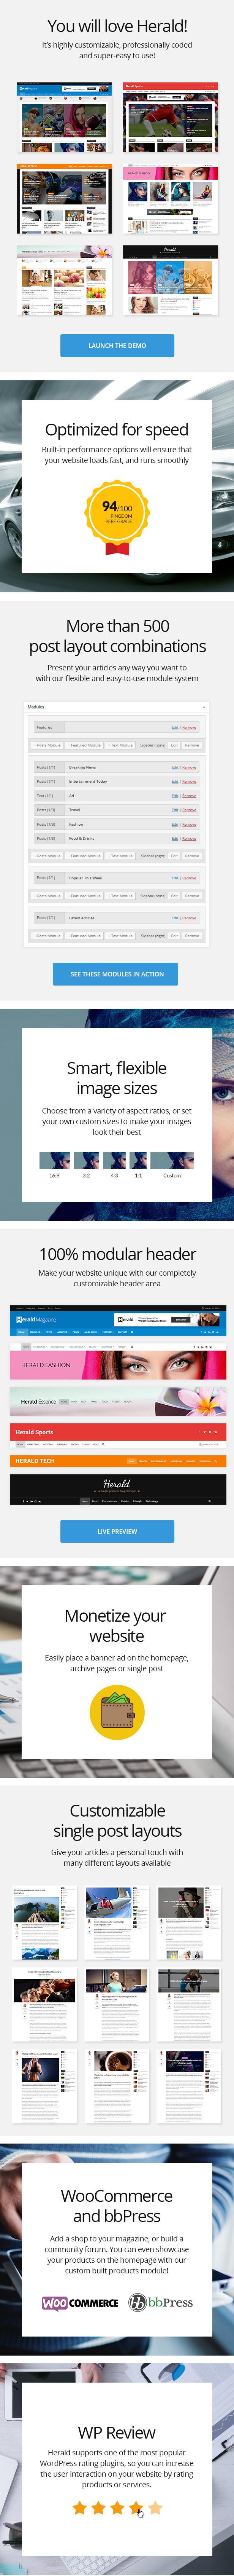 herald features part01 - Herald - Newspaper & News Portal WordPress Theme